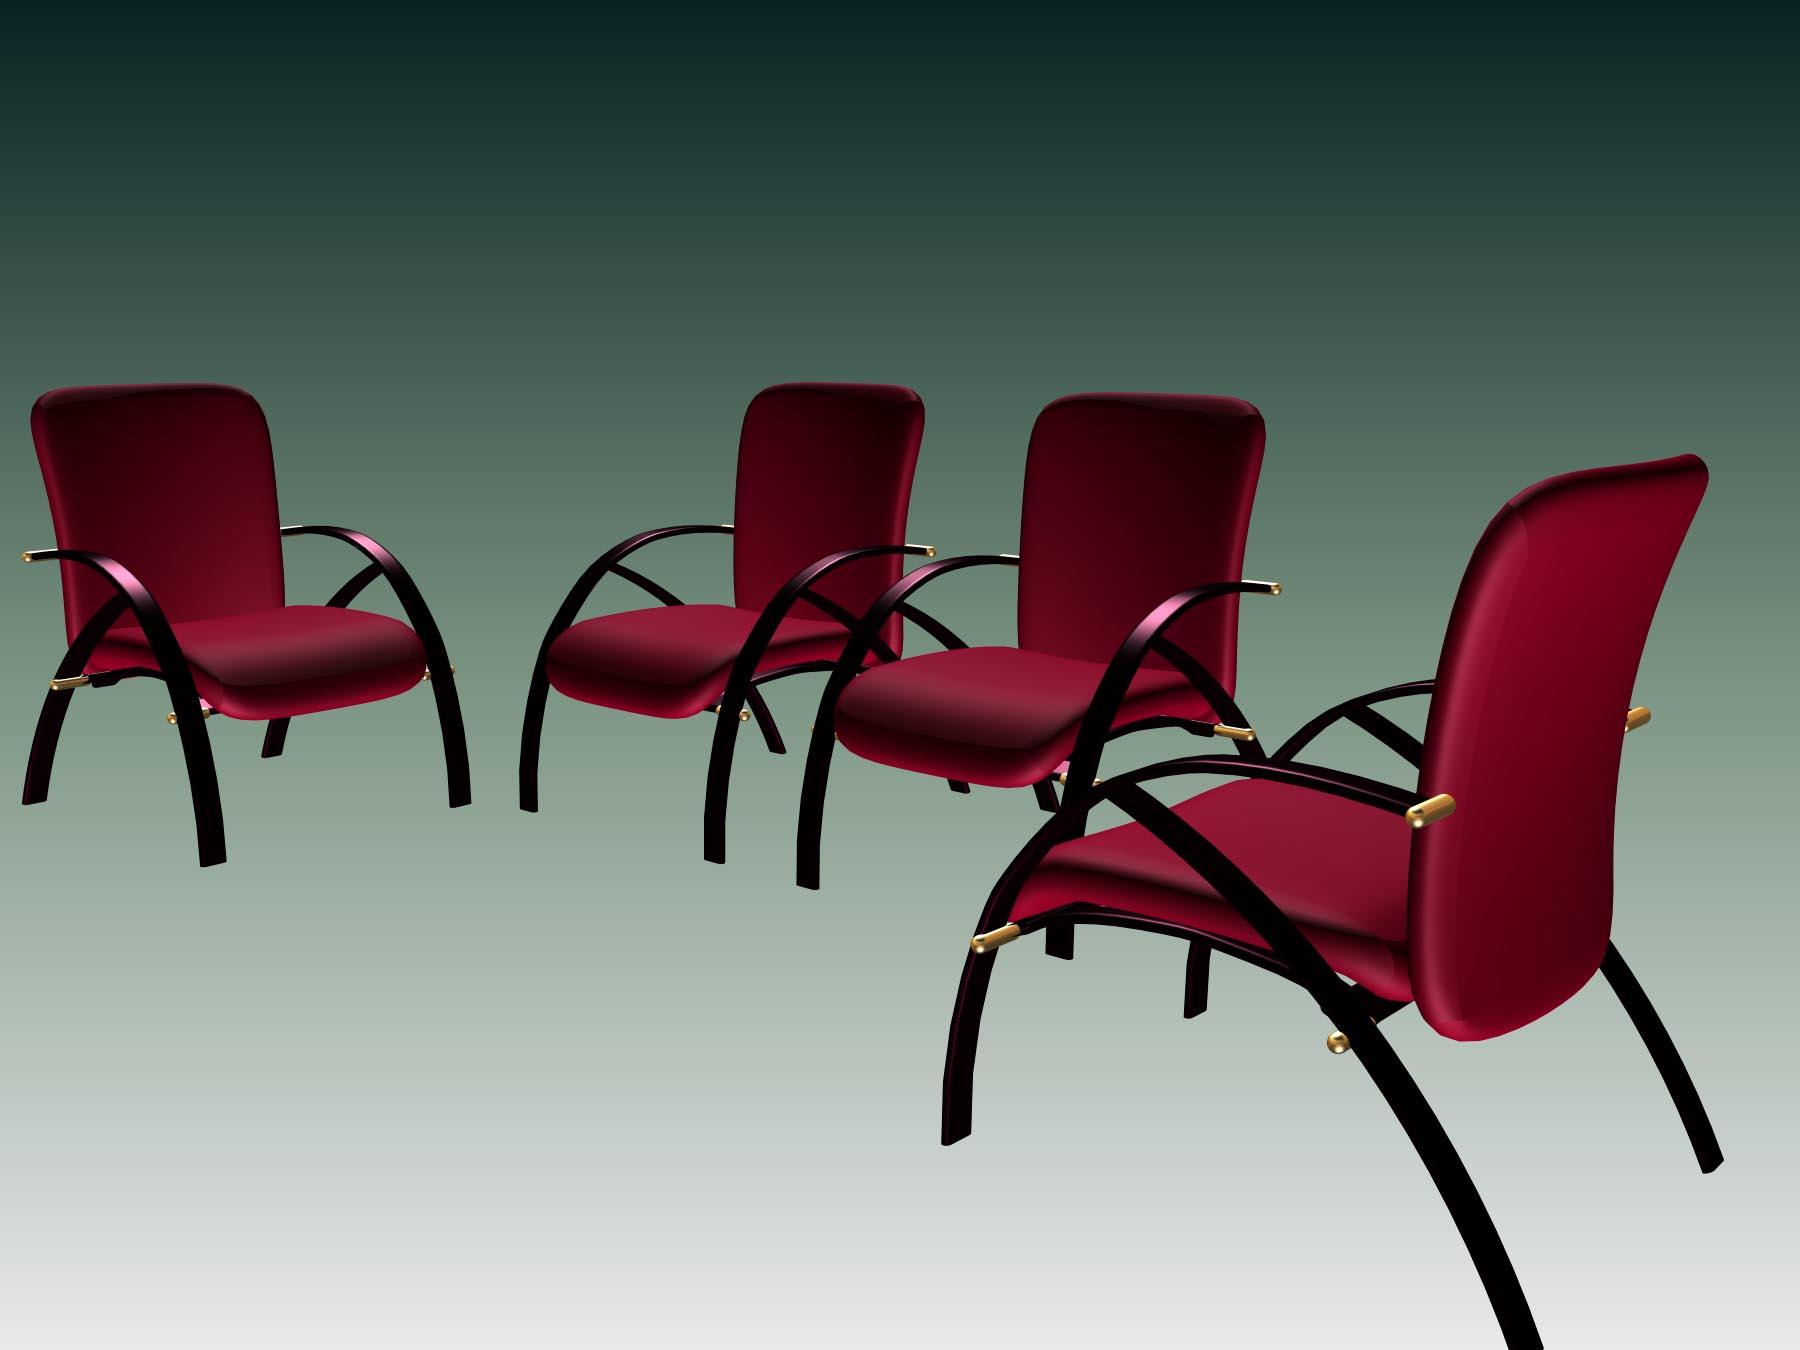 mobilier de bureau 003 24 3d model download free 3d. Black Bedroom Furniture Sets. Home Design Ideas